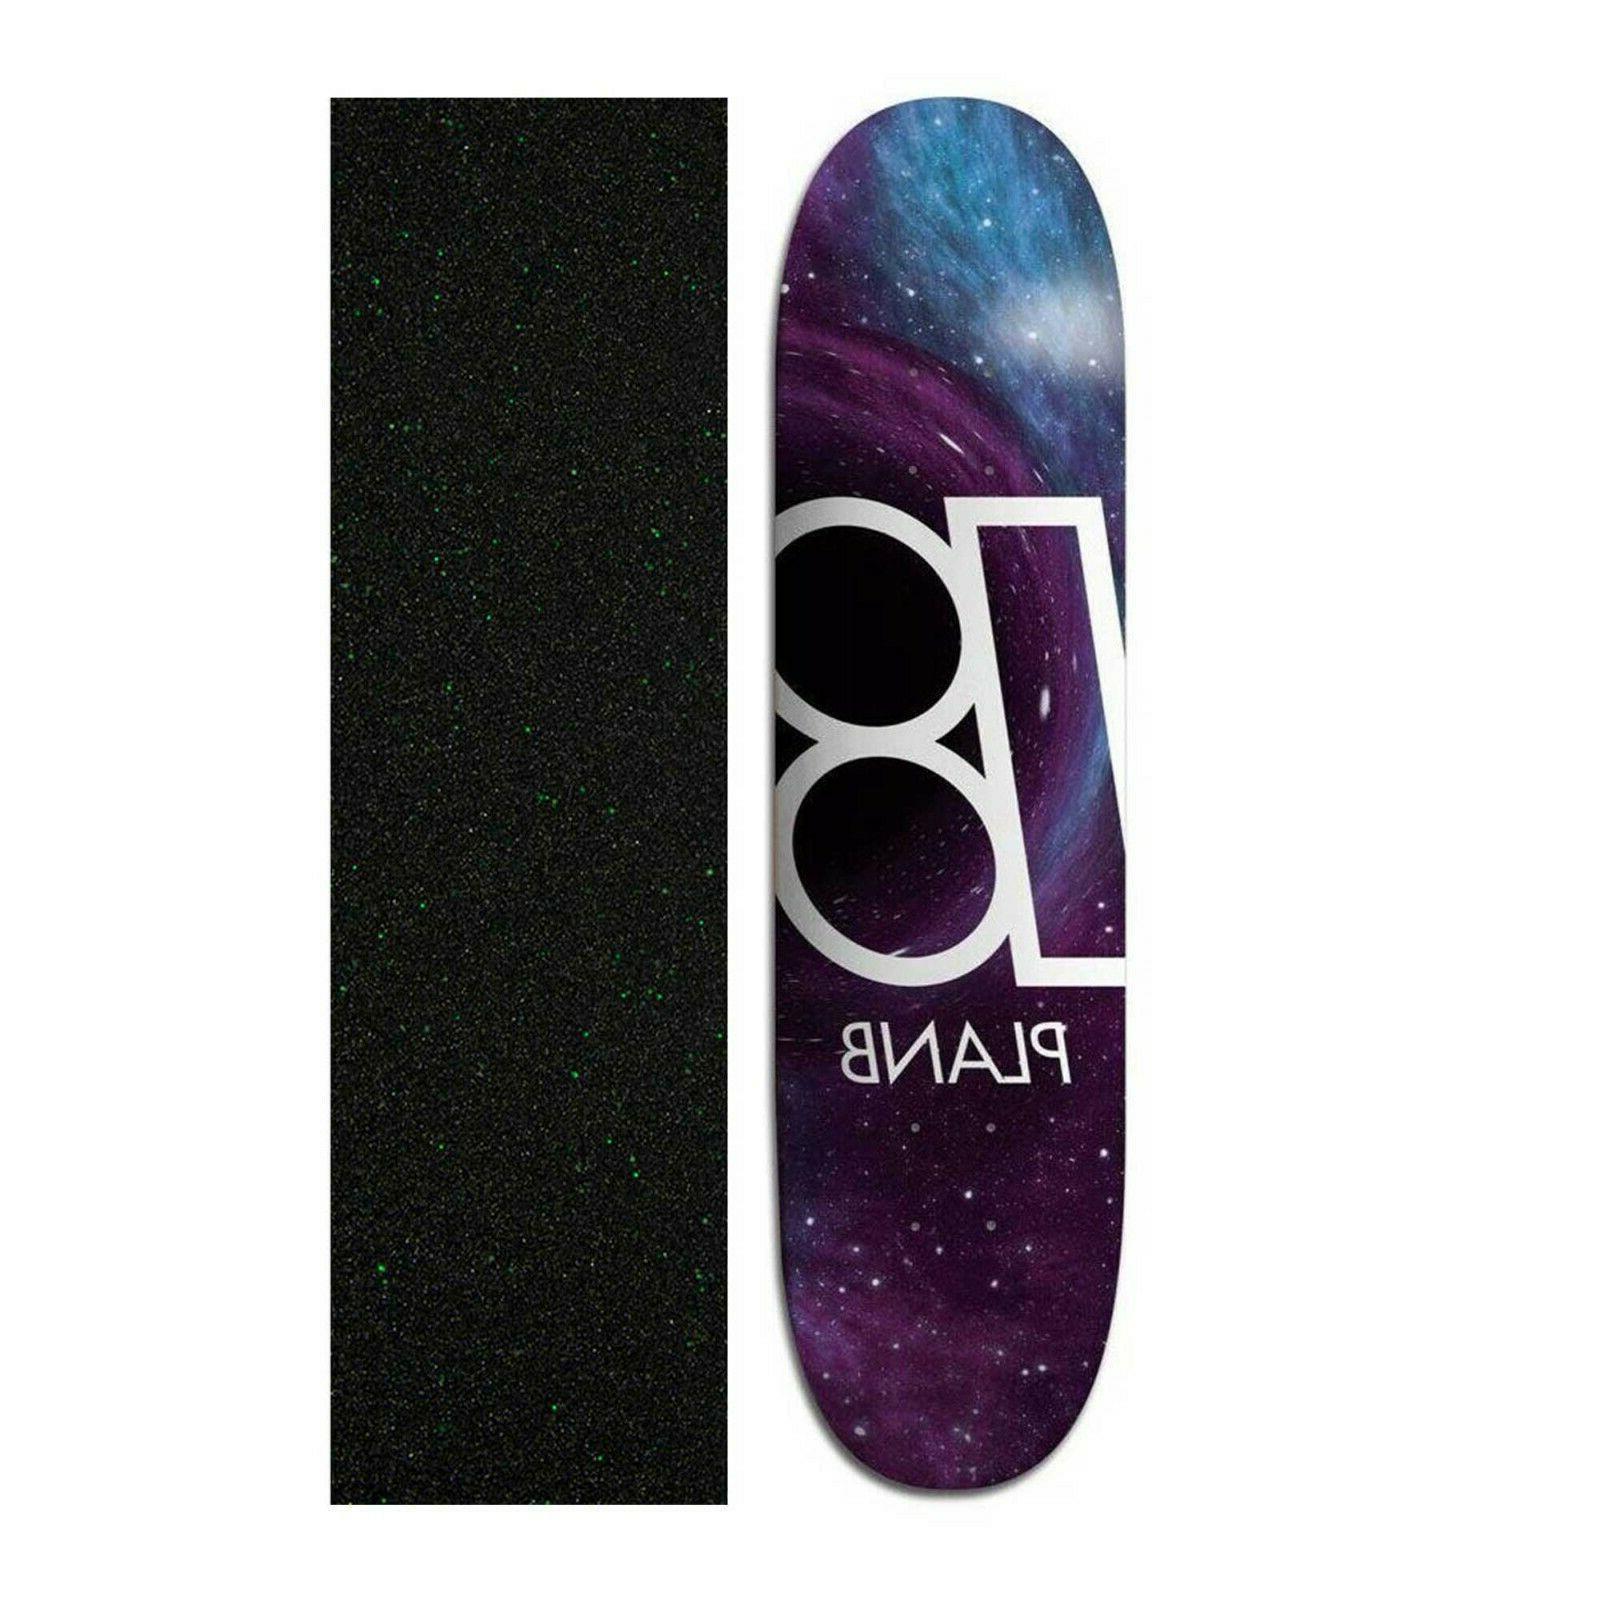 8 25 team black hole skateboard deck